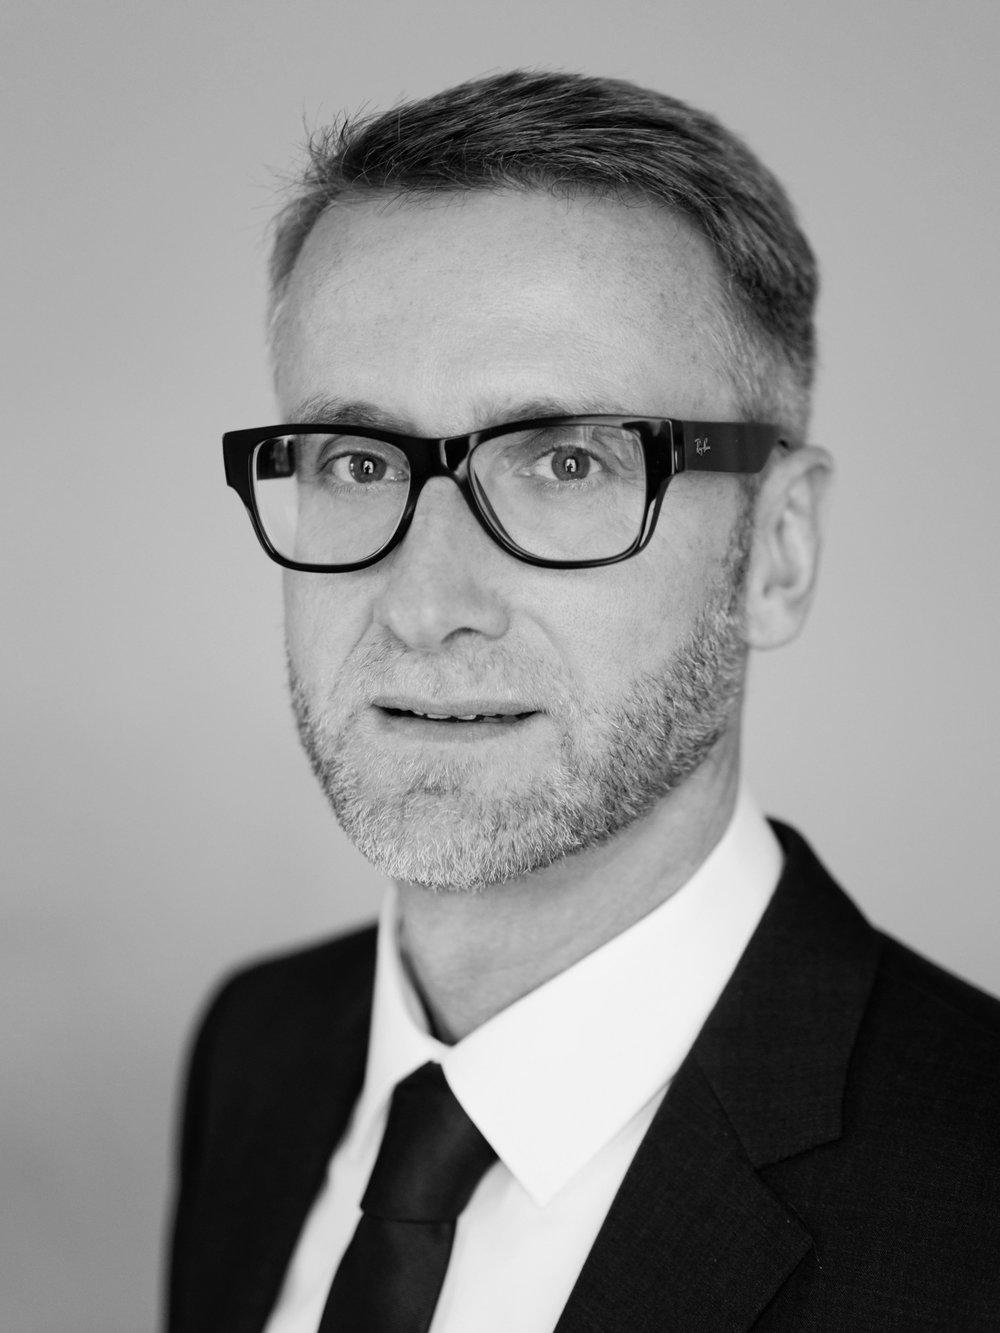 Businessportraits Portraitfotograf in Bonn | Bewerbungs und Image Portraits